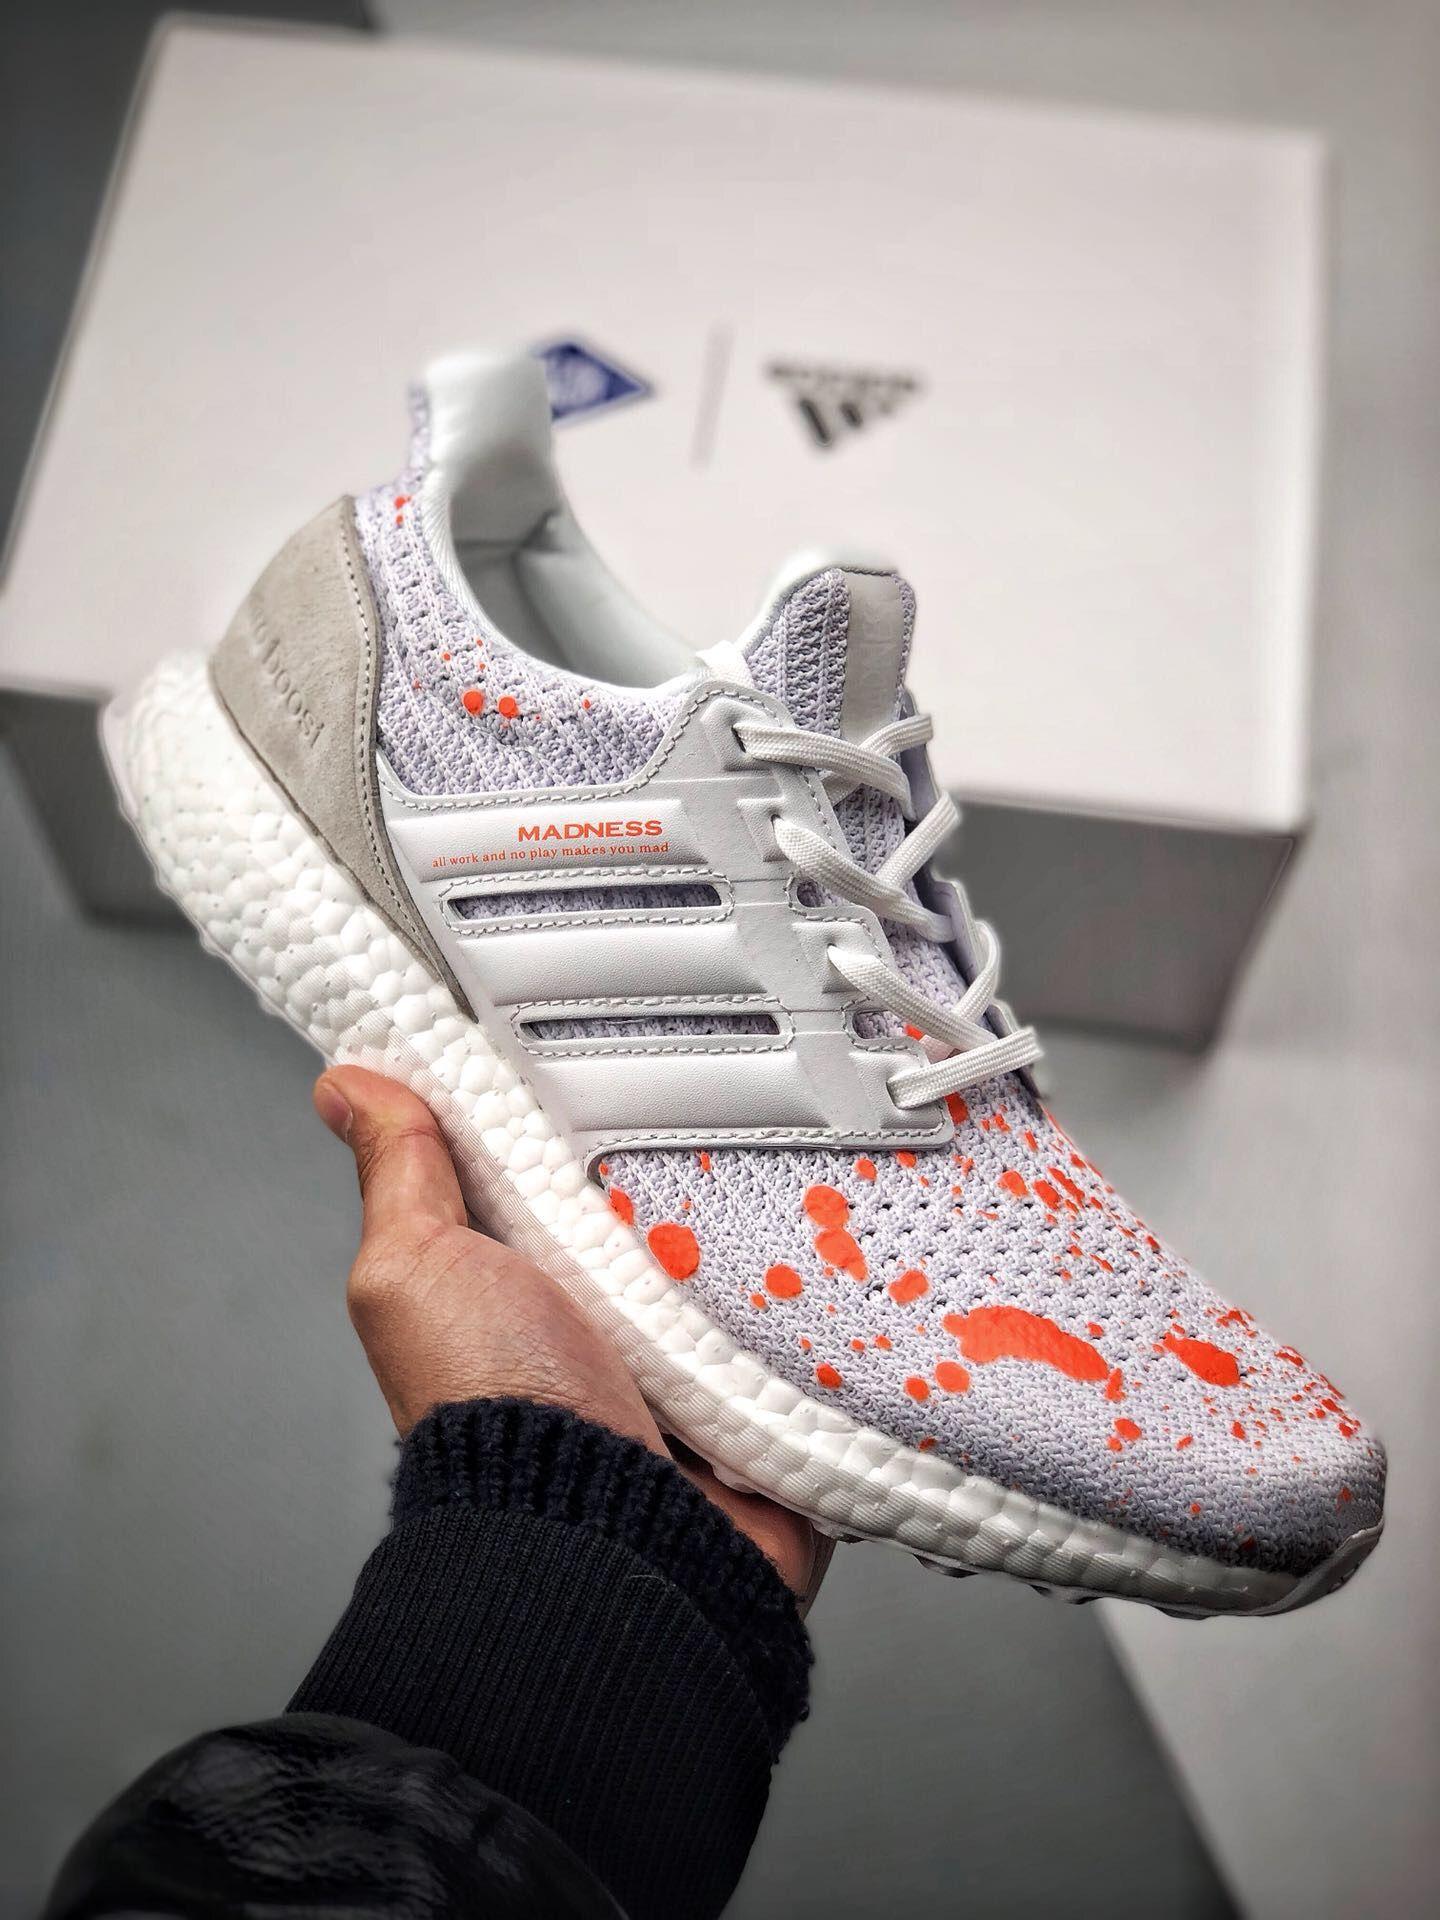 adidas madness ultra boost